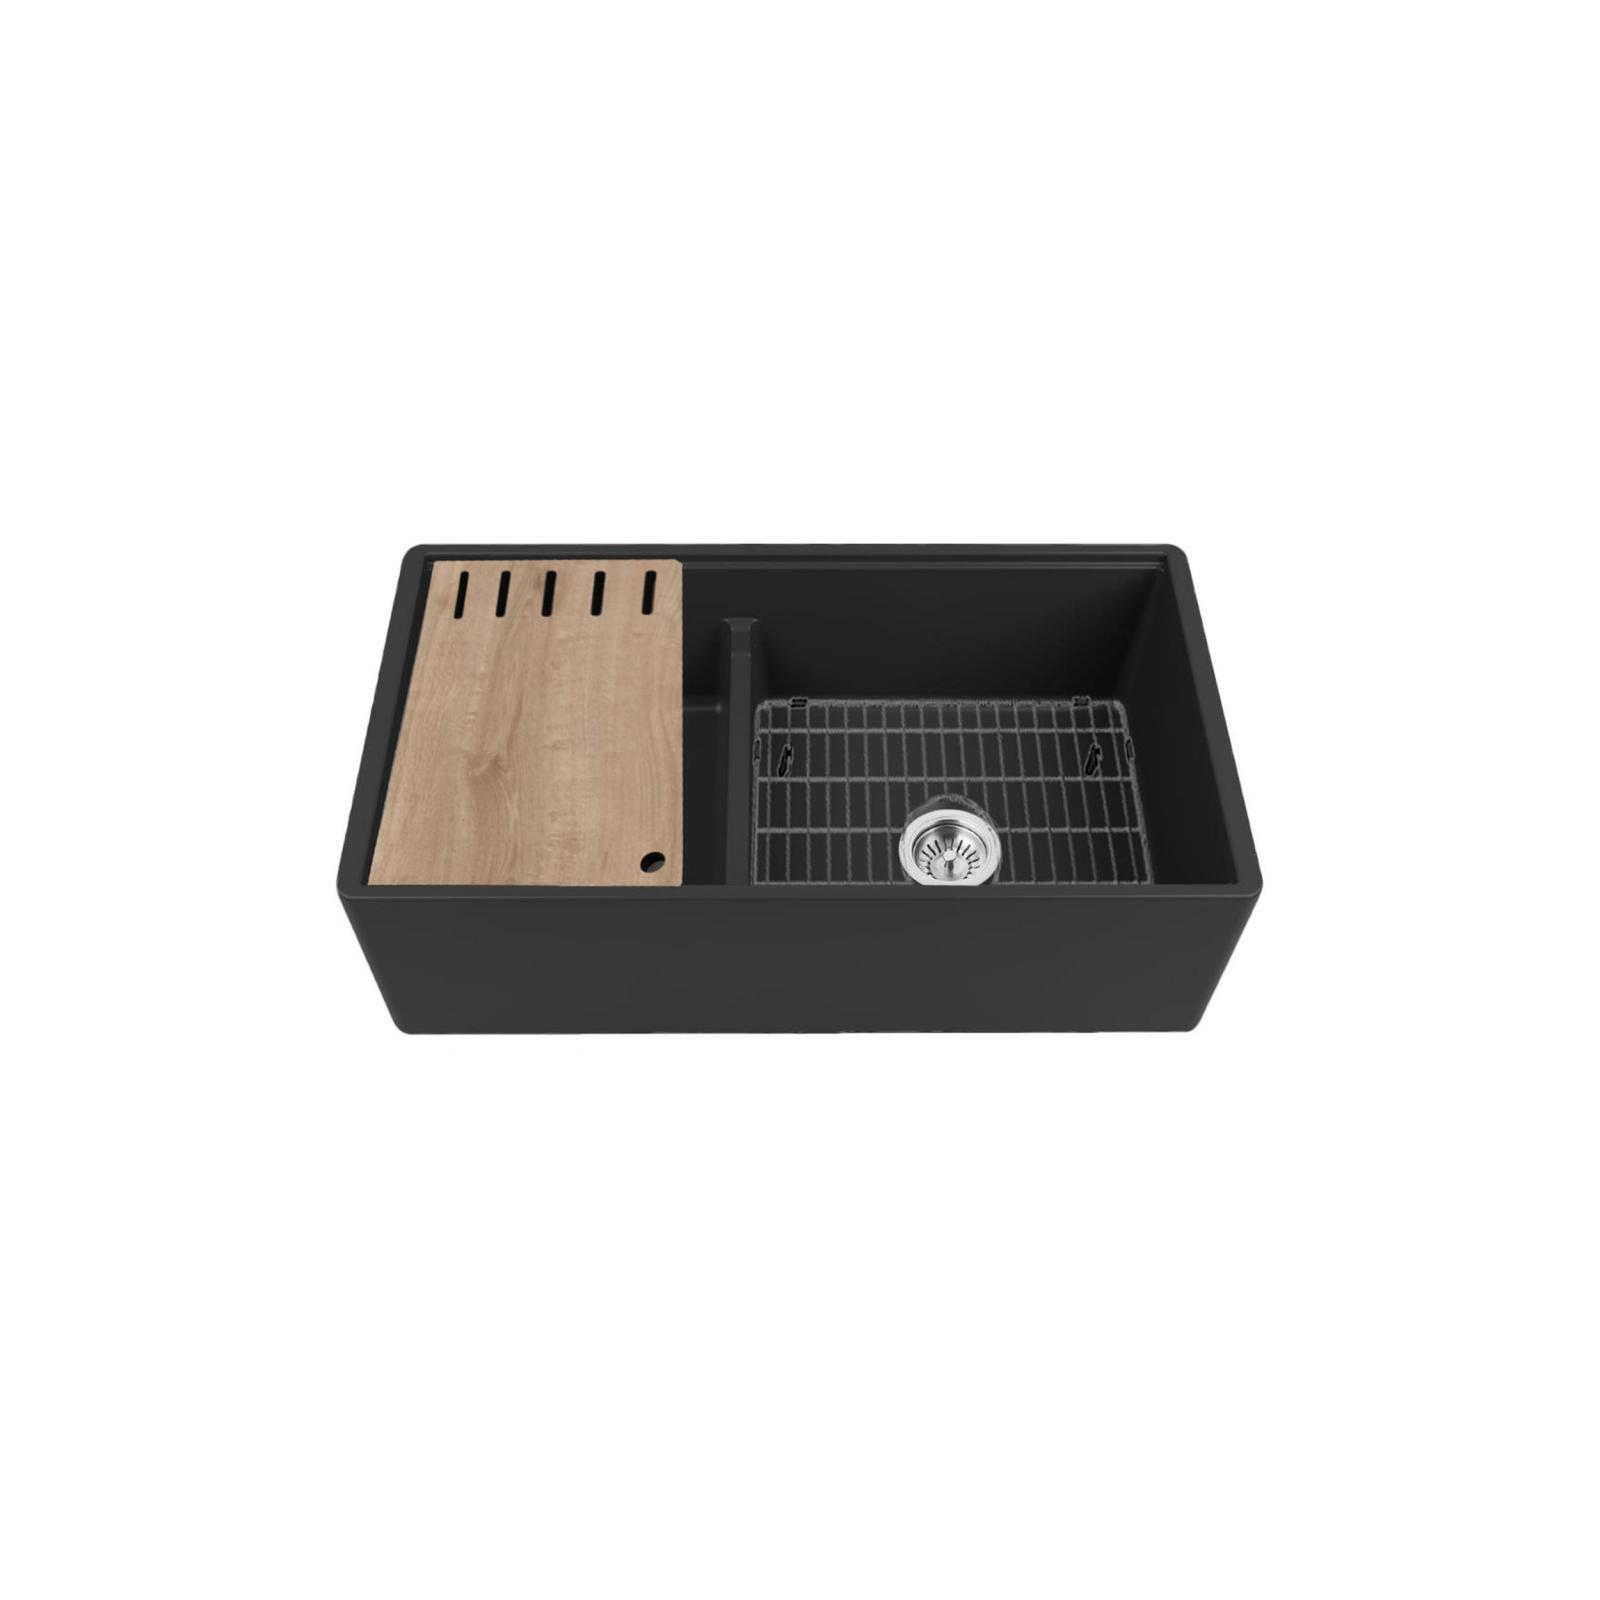 High-quality sink Louis Le Grand II black - single bowl, ceramic - 3